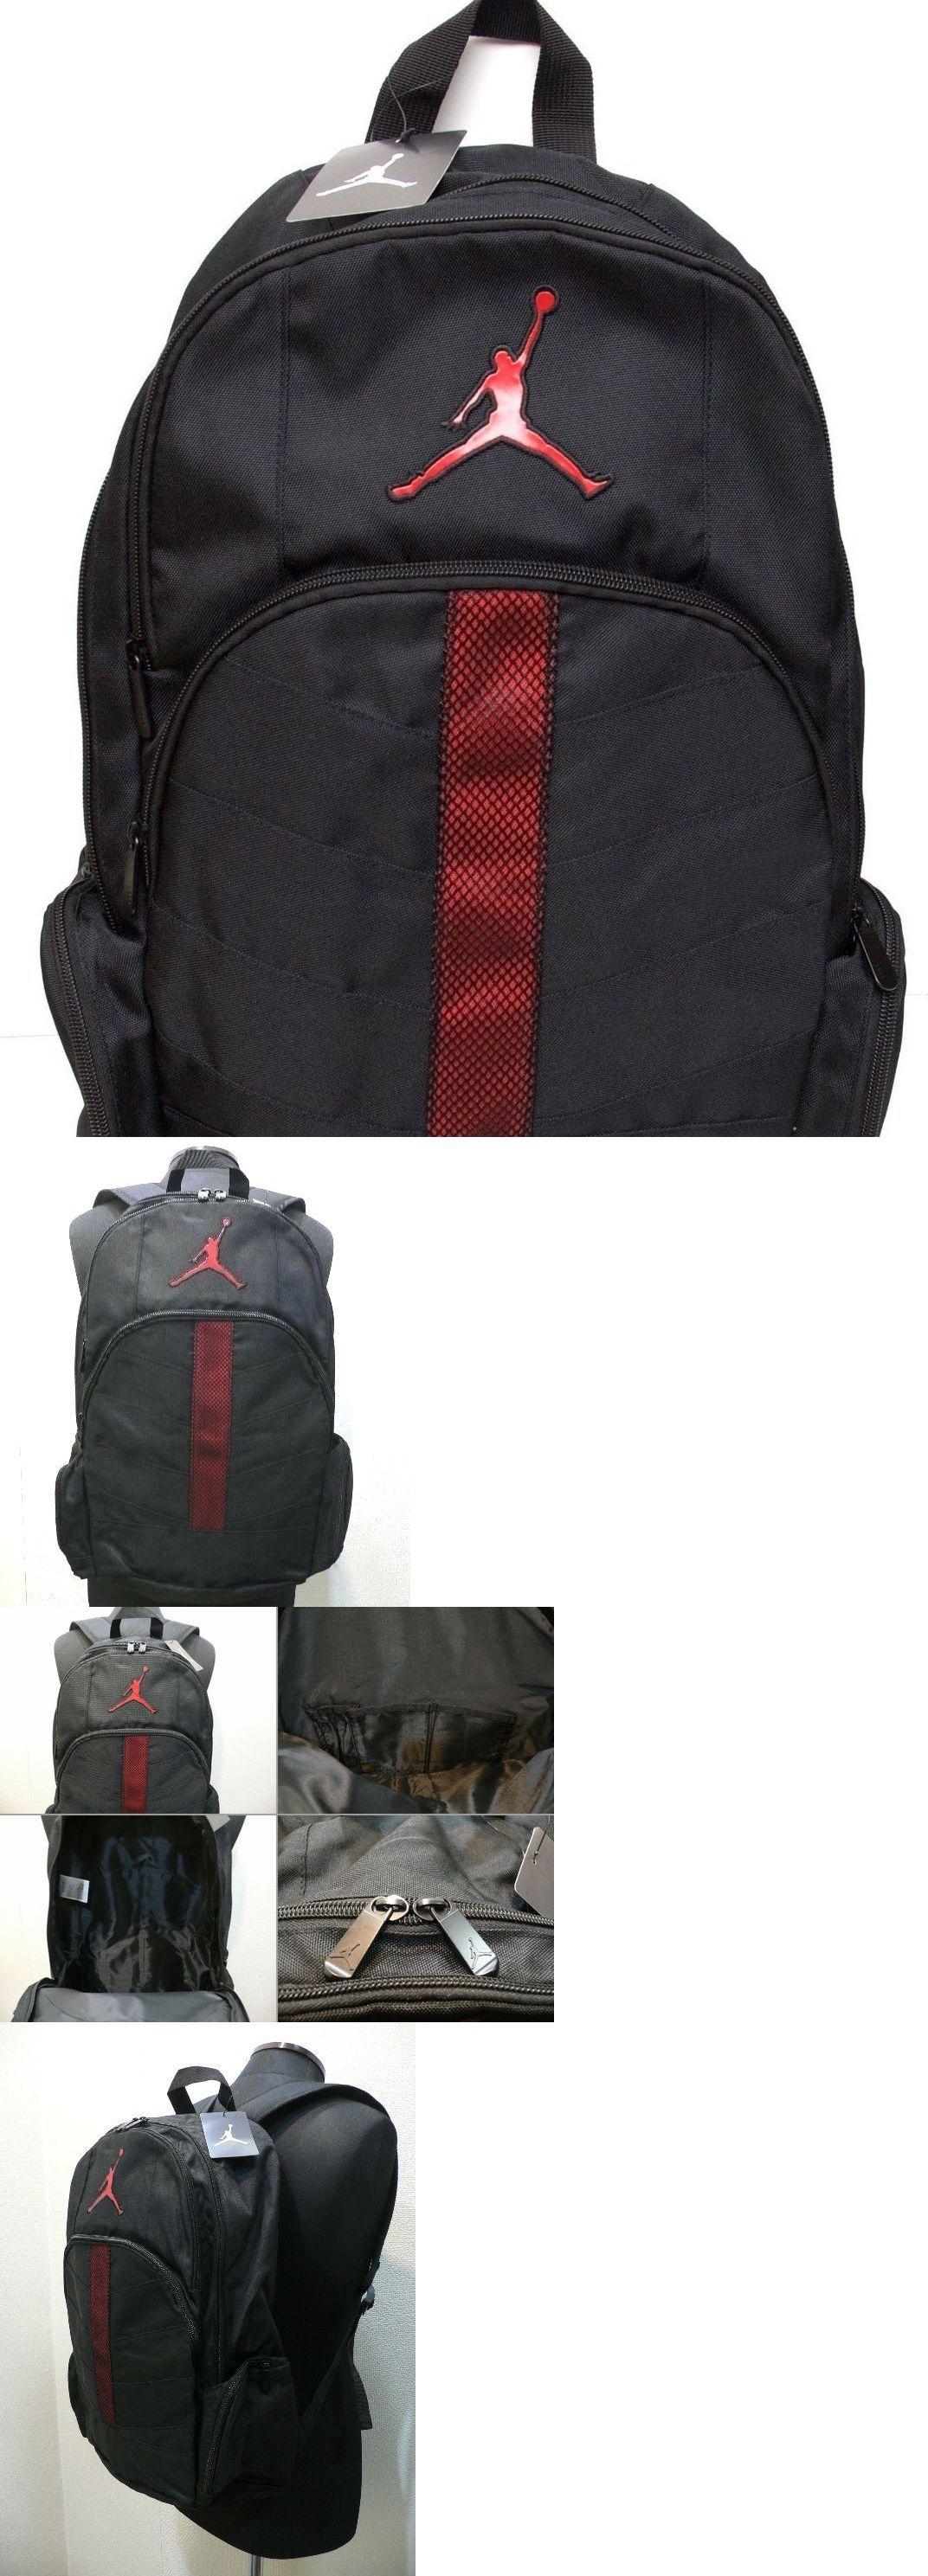 Bags And Backpacks 163537 Nike Air Jordan Jumpman Gym Book Backpack Laptop Bag Black Red